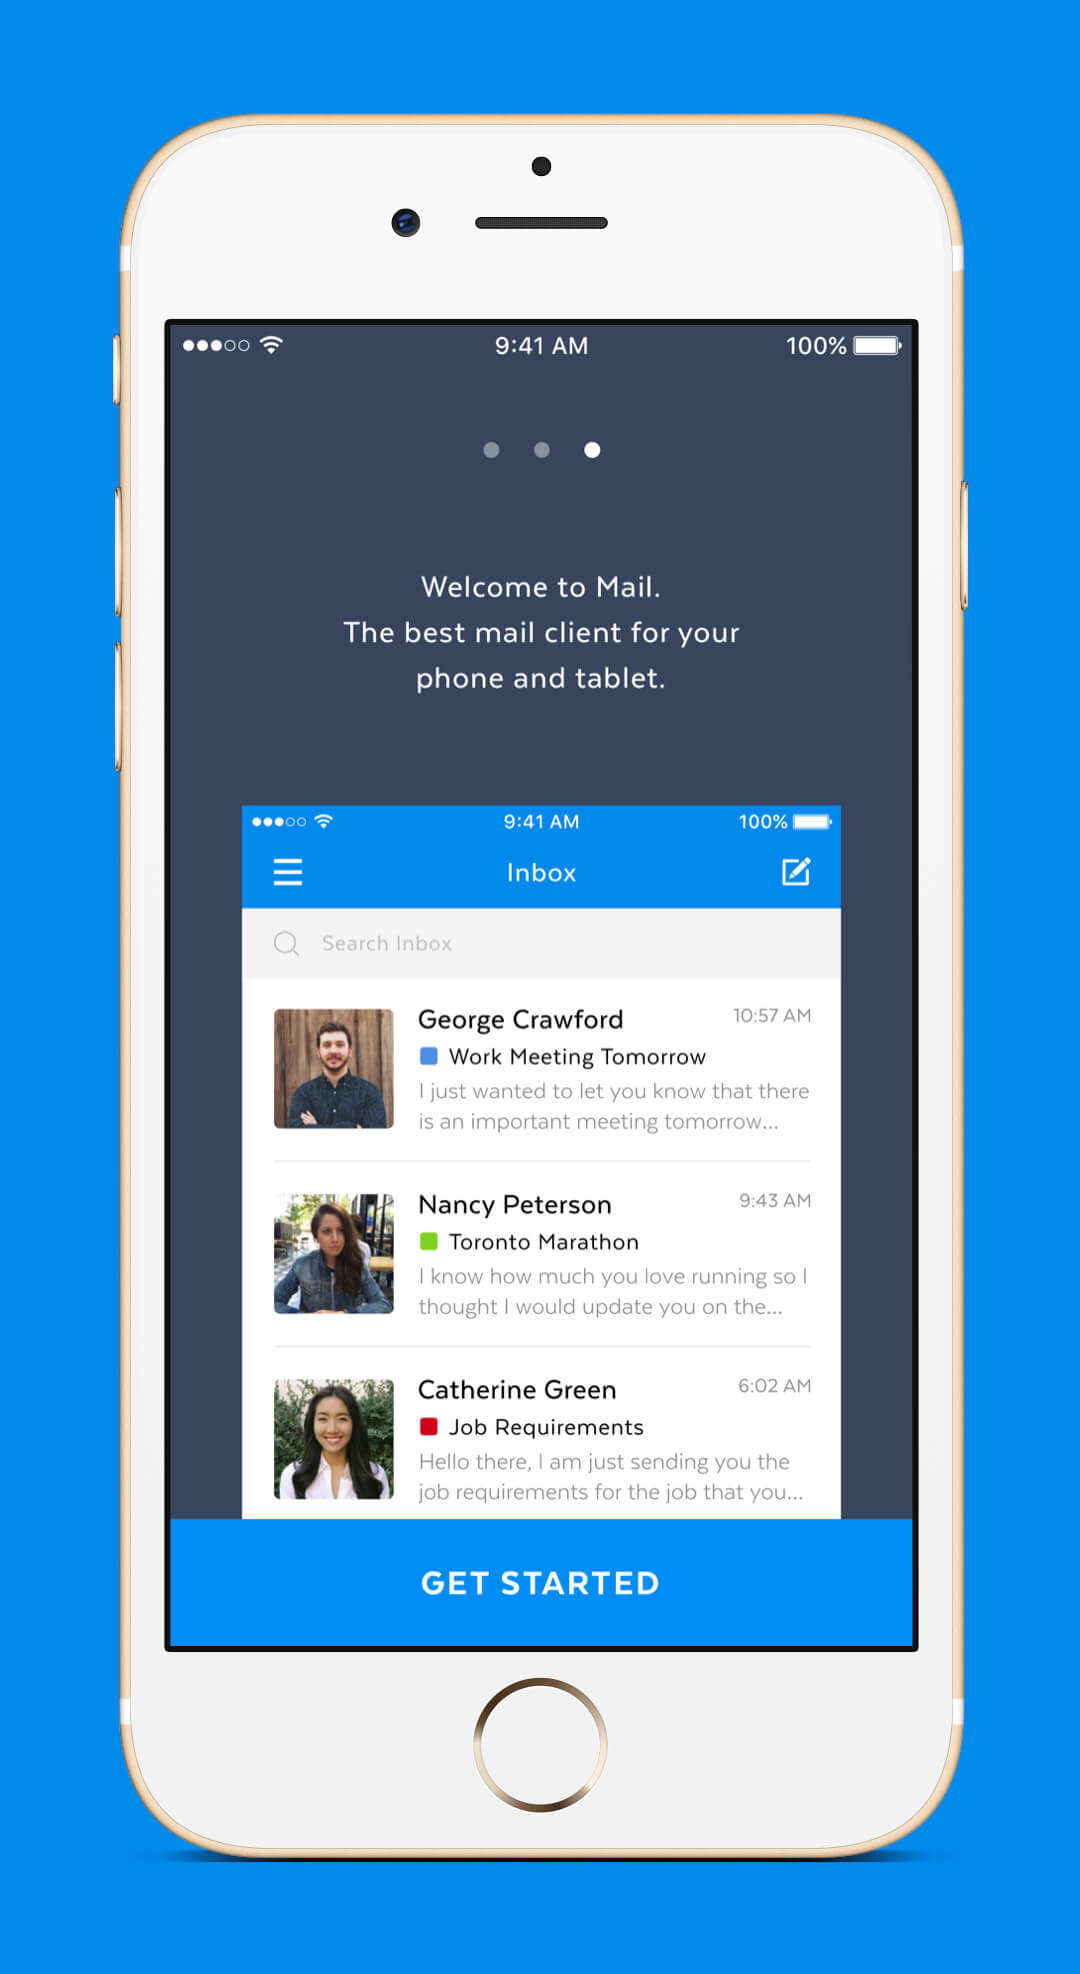 Mobile Mail App - Walkthrough Screen